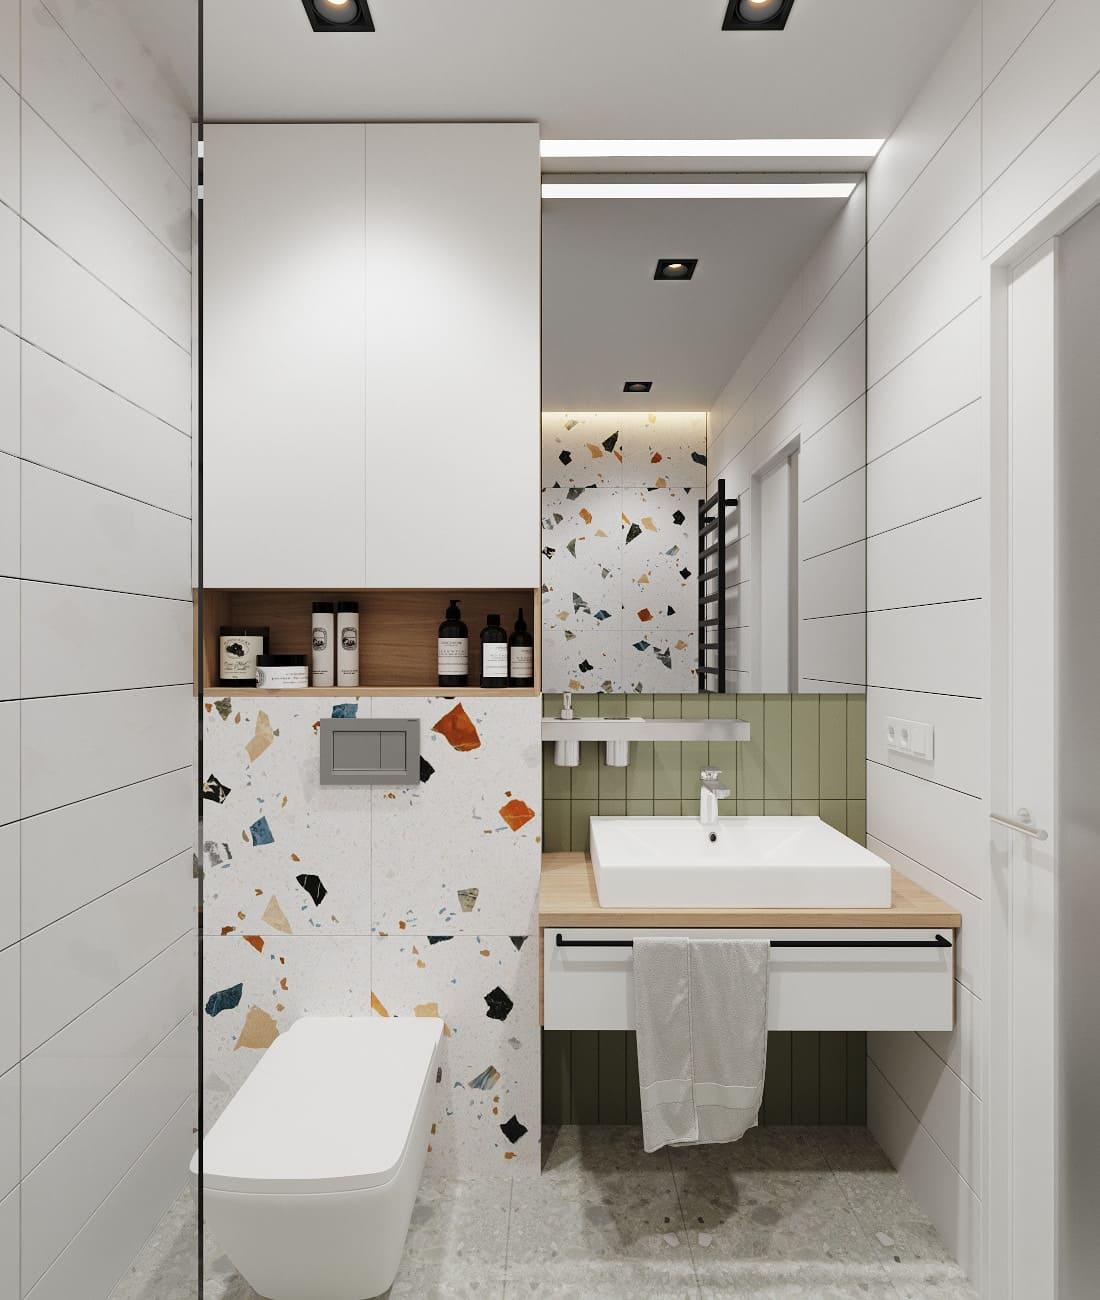 дизайн интерьера модной квартиры фото 93